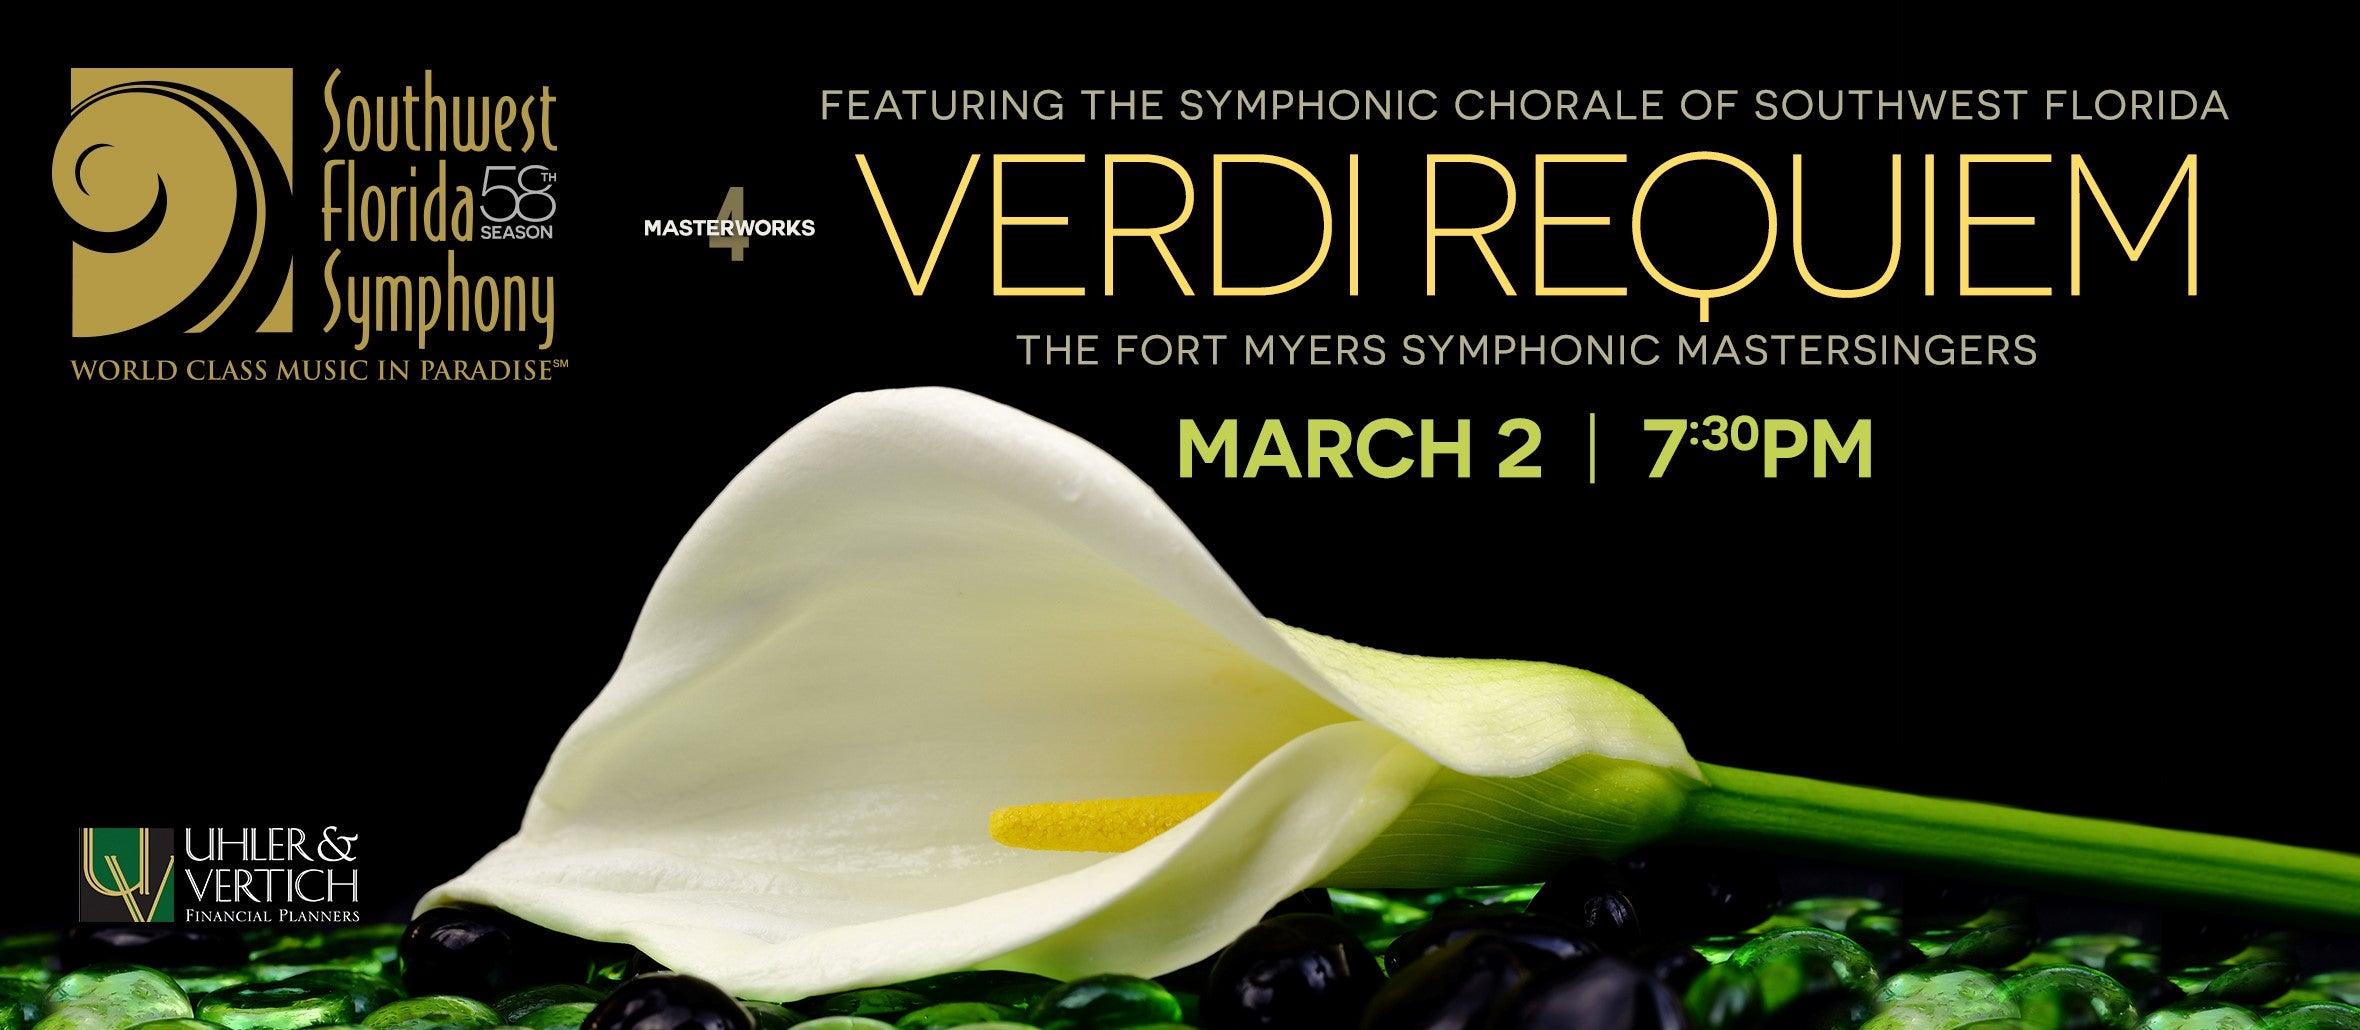 Southwest Florida Symphony: Verdi Requiem